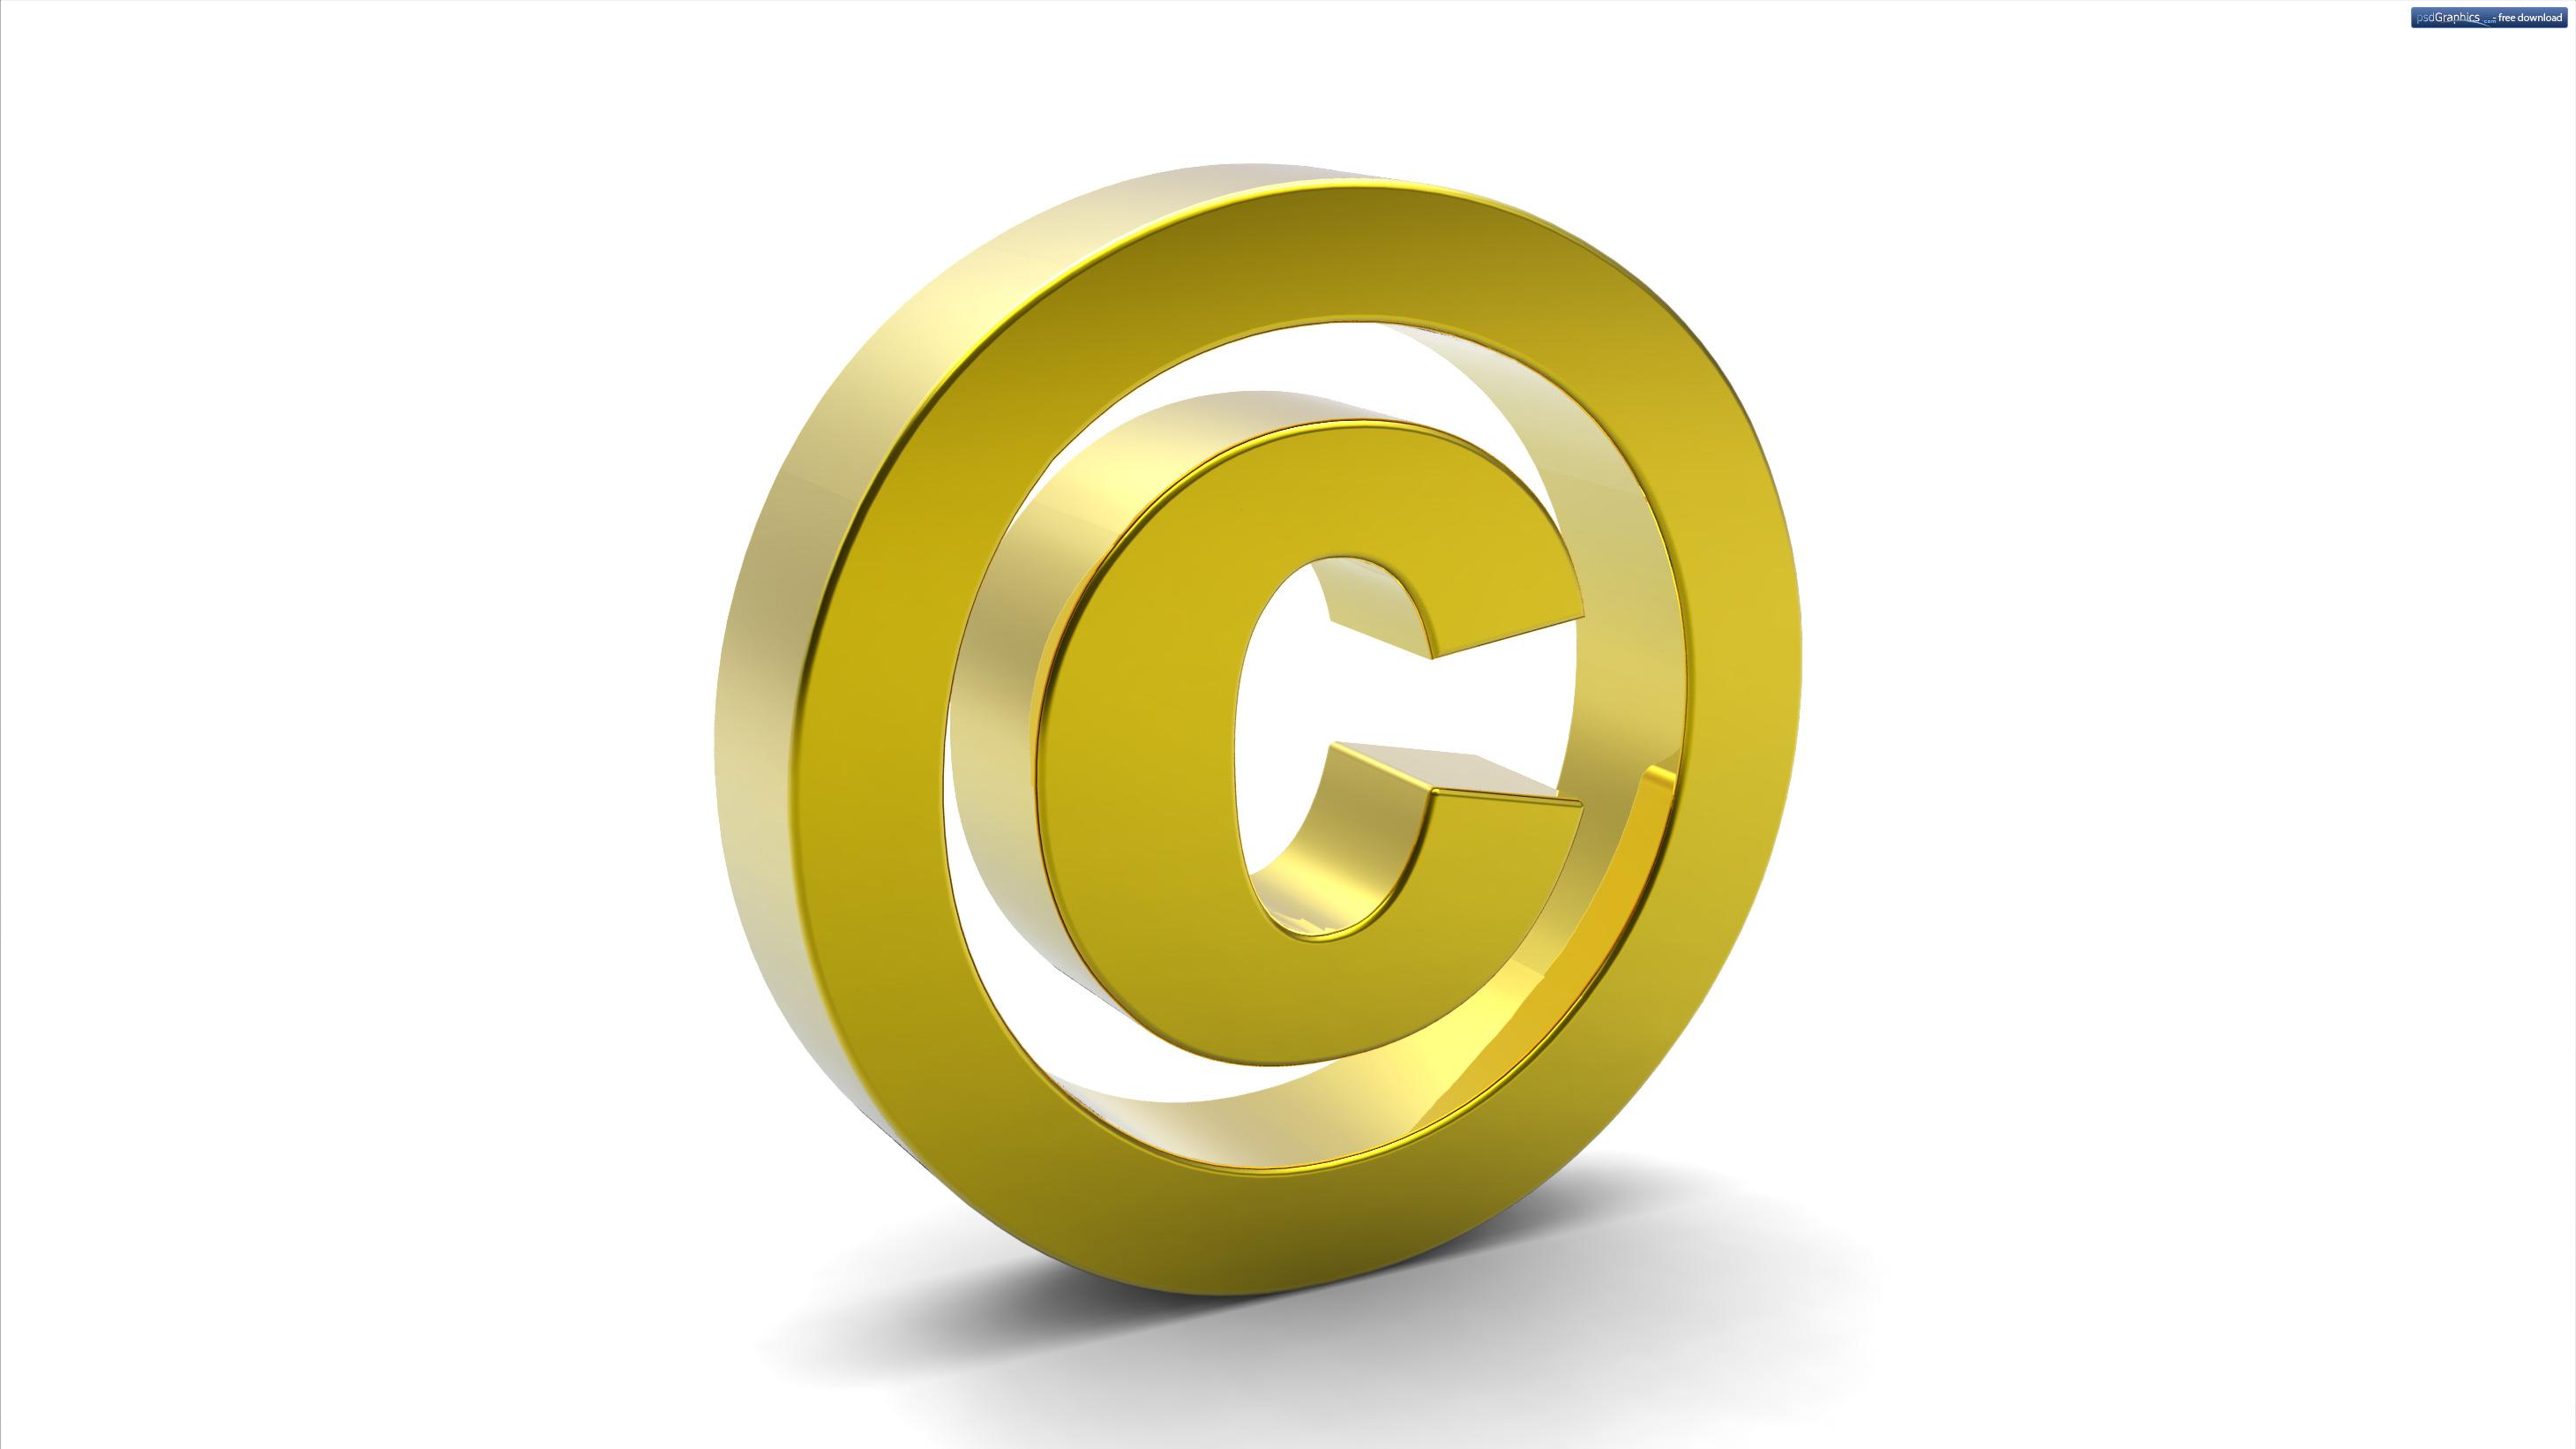 how to write copyright symbol on mac